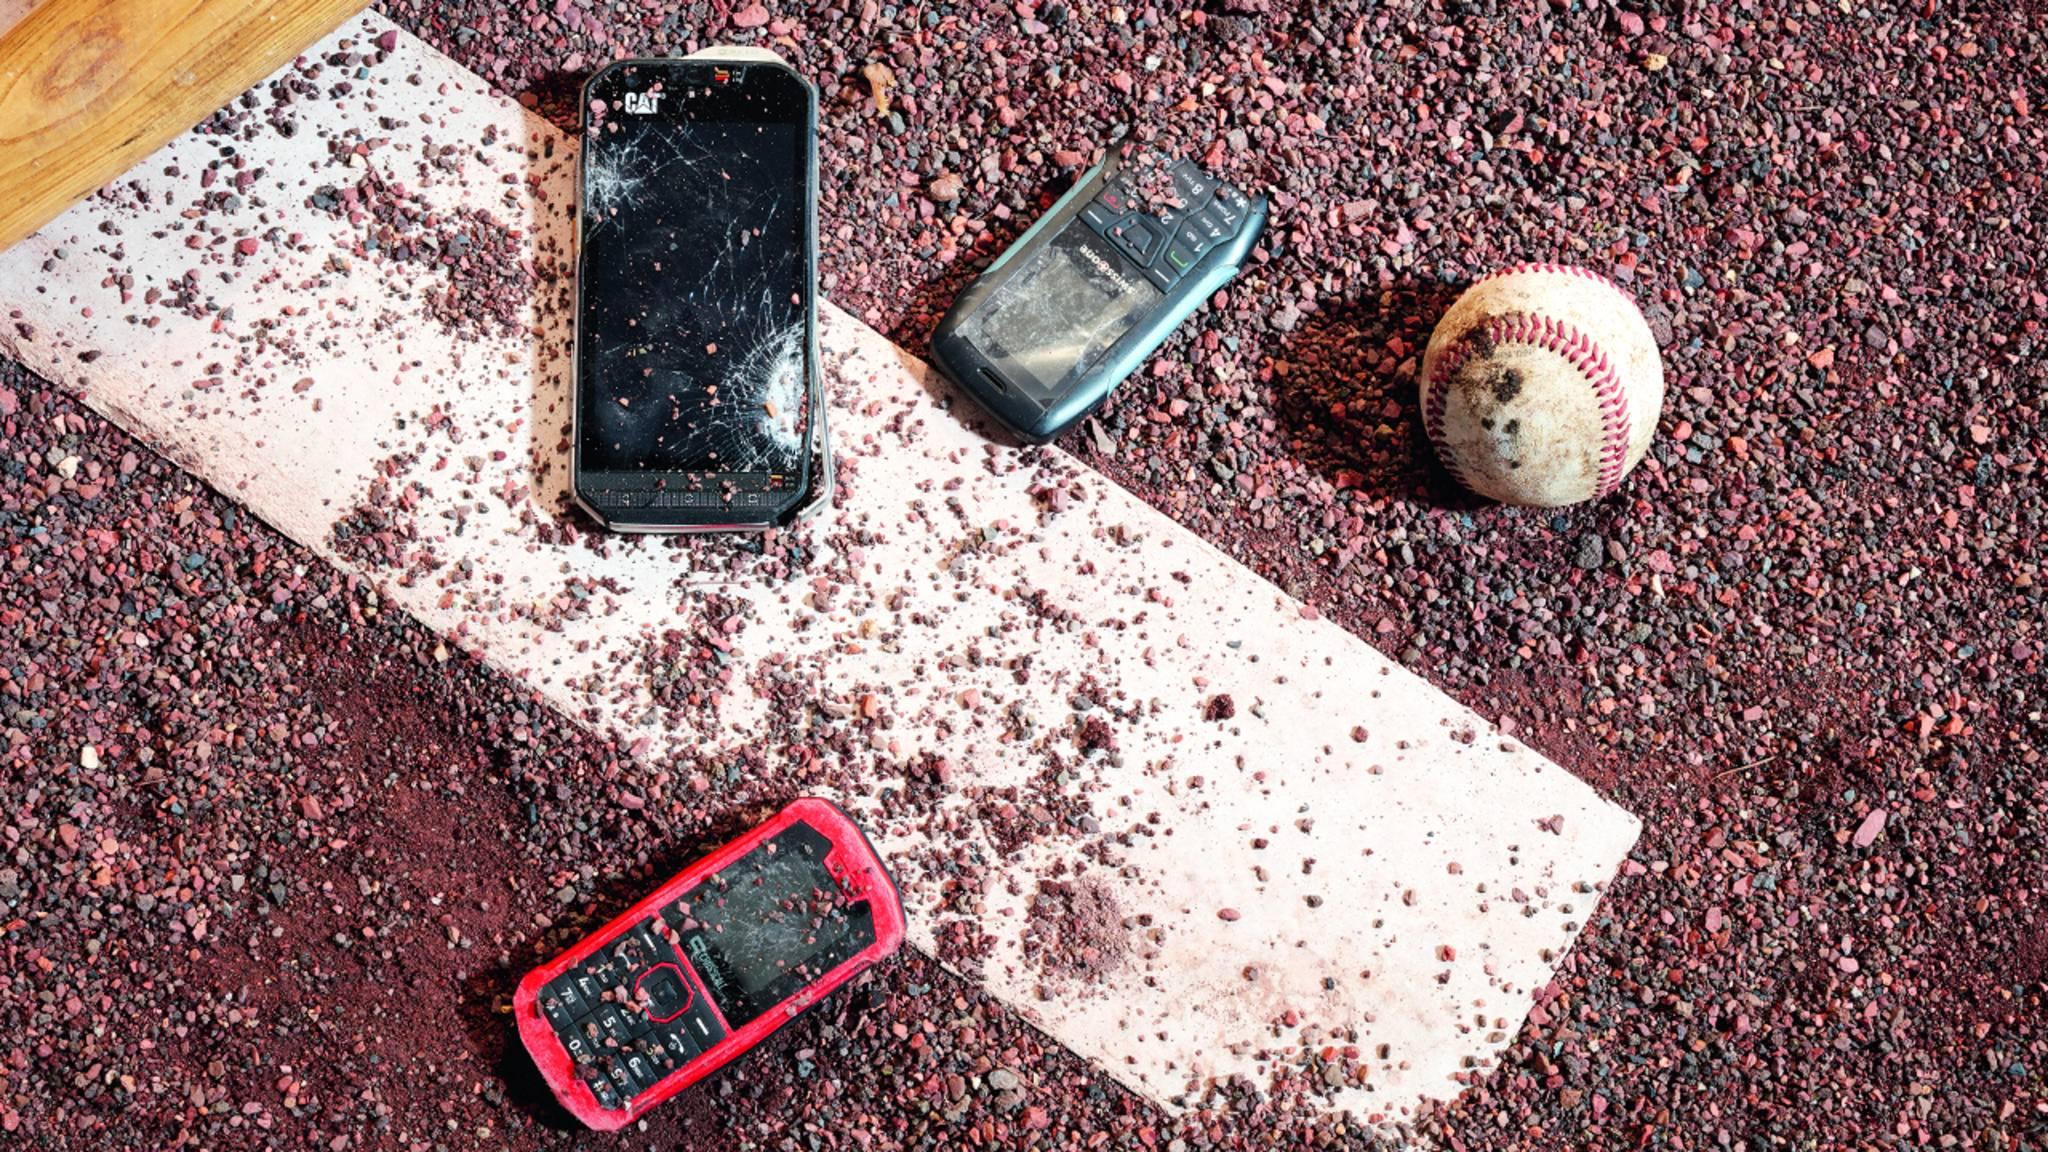 TURN ON hat Outdoor-Handys verschiedenen Härtetests unterzogen.